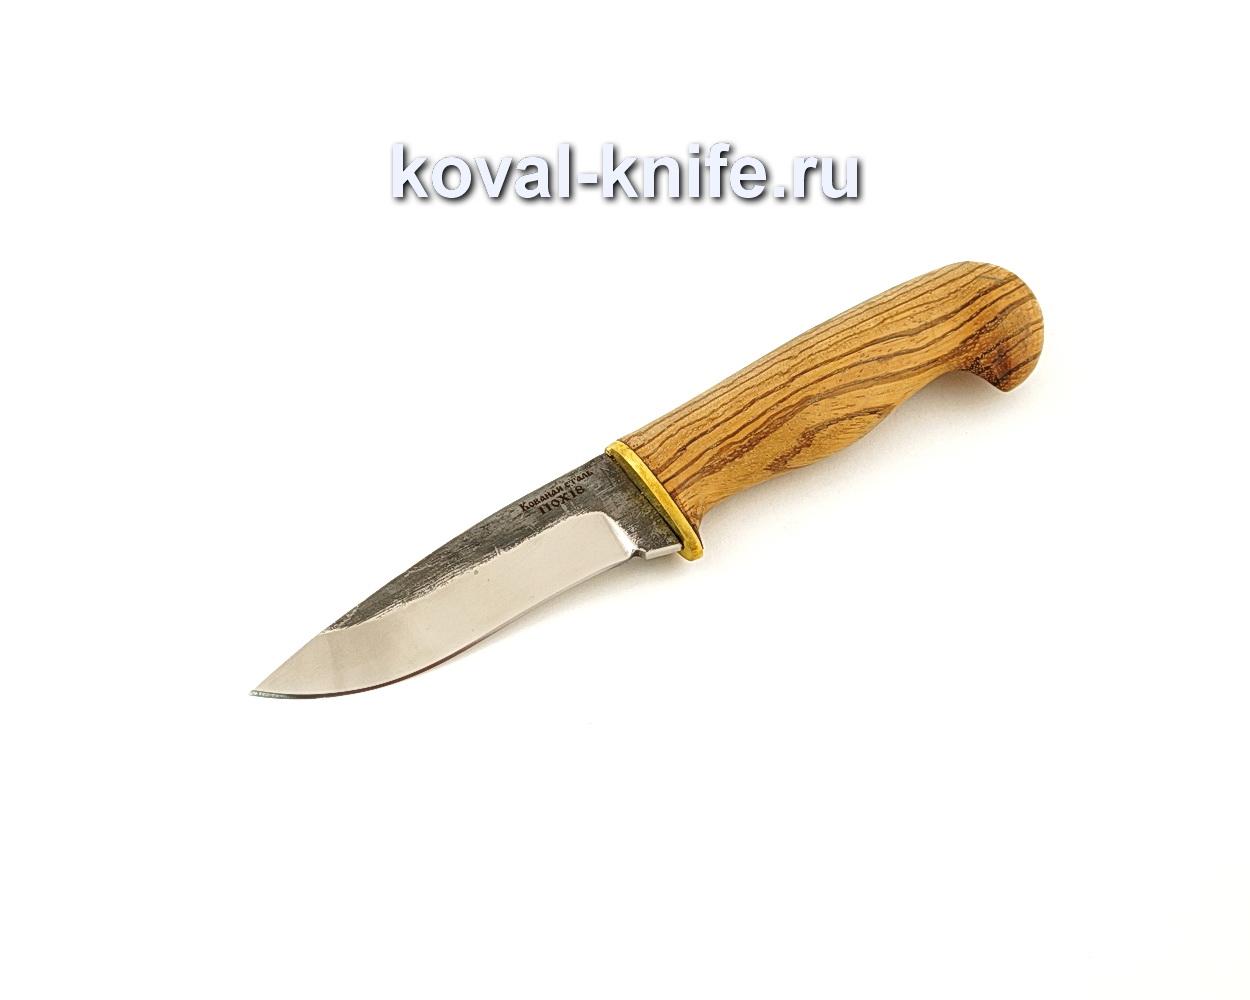 Нож Сапсан из кованой стали 110Х18 с рукоятью из зебрано  A650